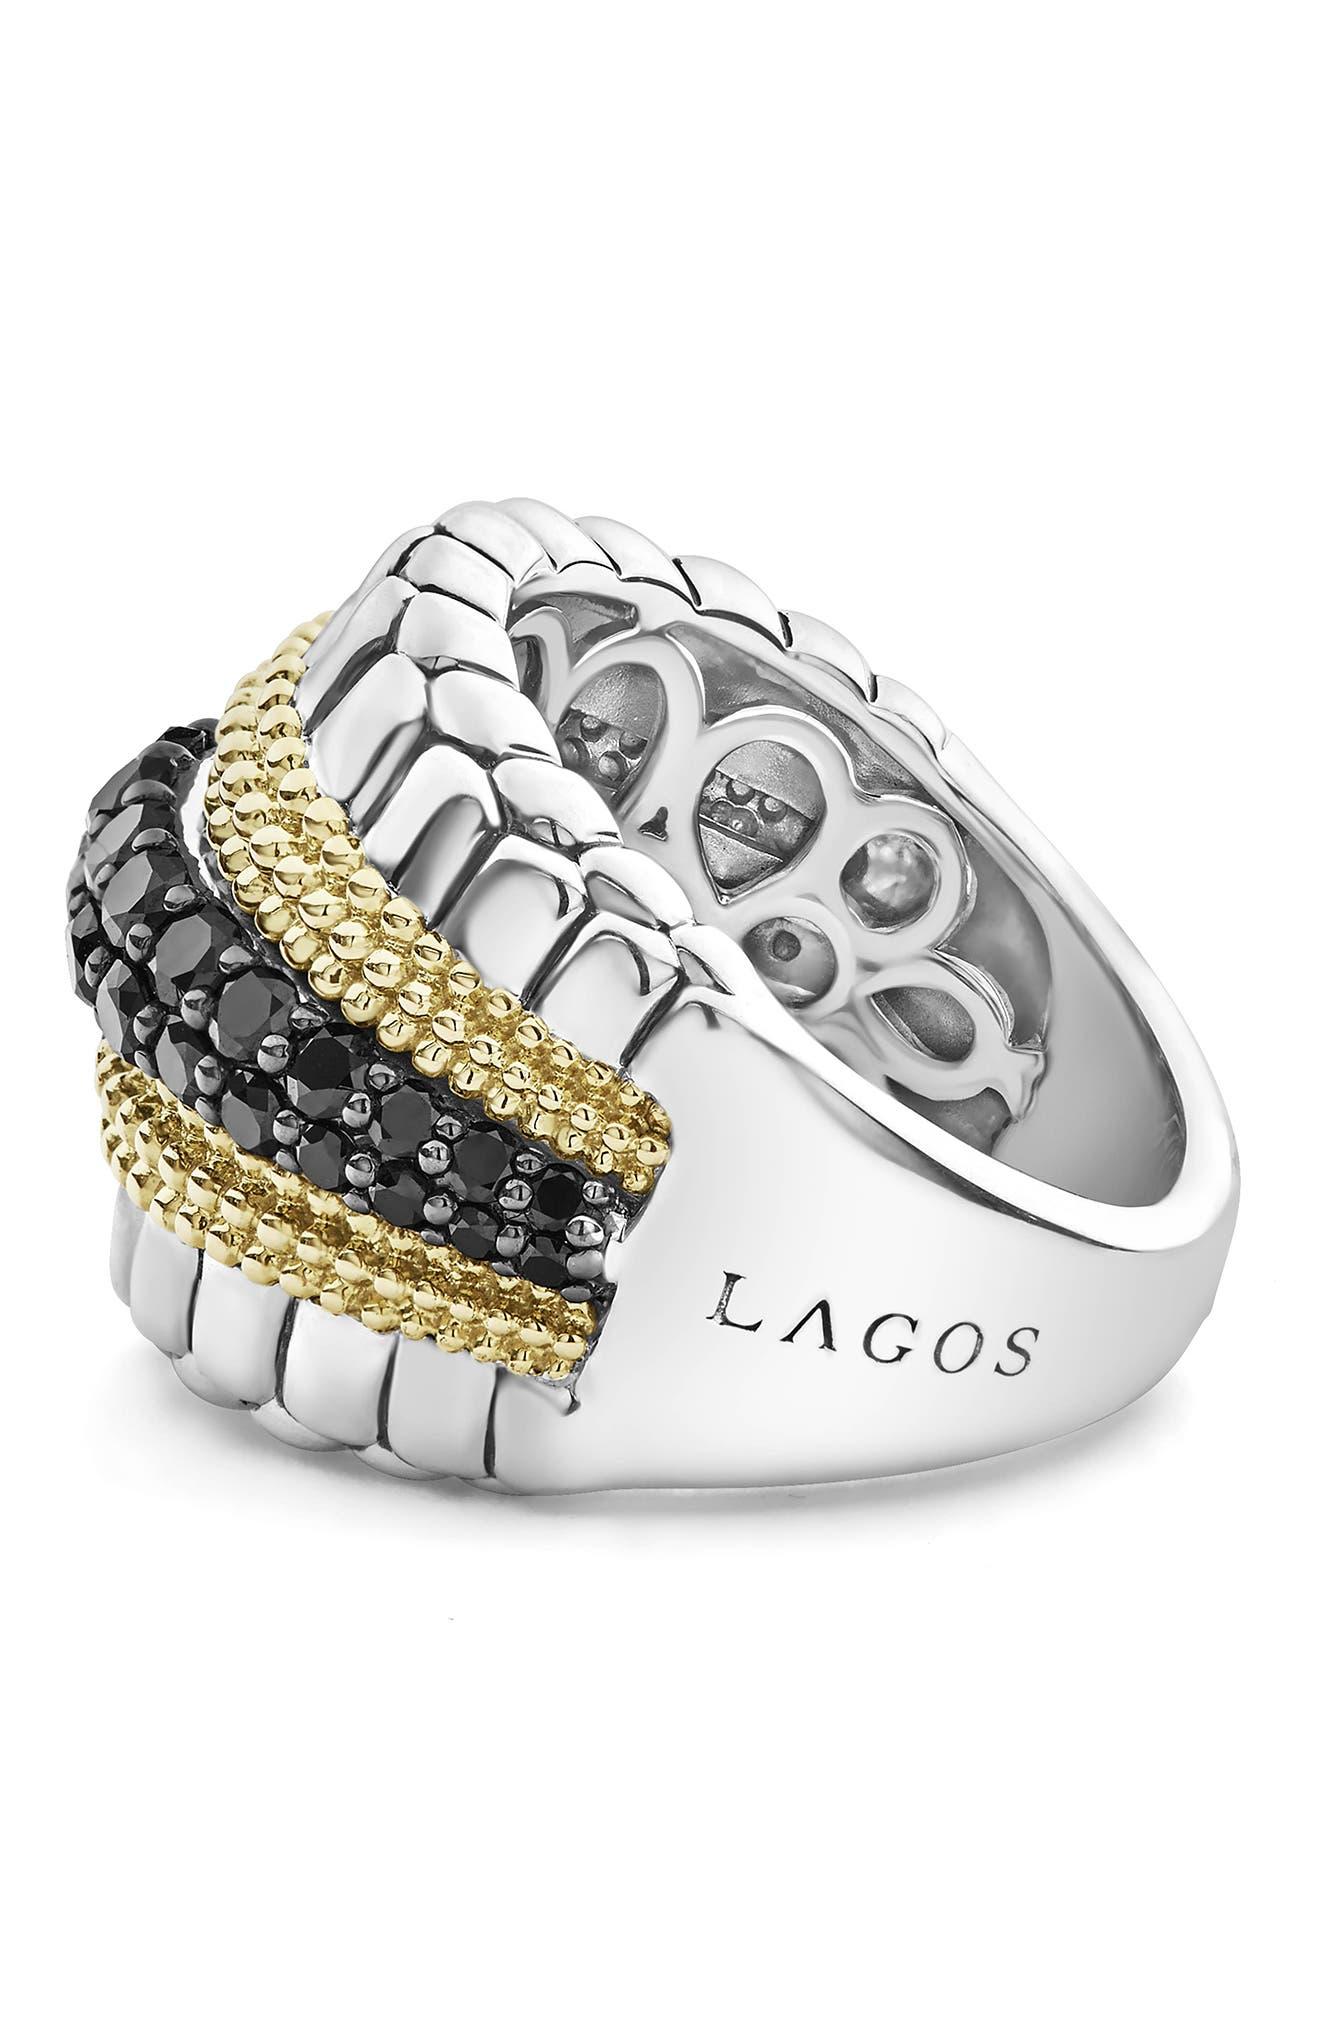 Diamond Lux Black Diamond Band Ring,                             Alternate thumbnail 3, color,                             SILVER/ GOLD/ BLACK DIAMOND